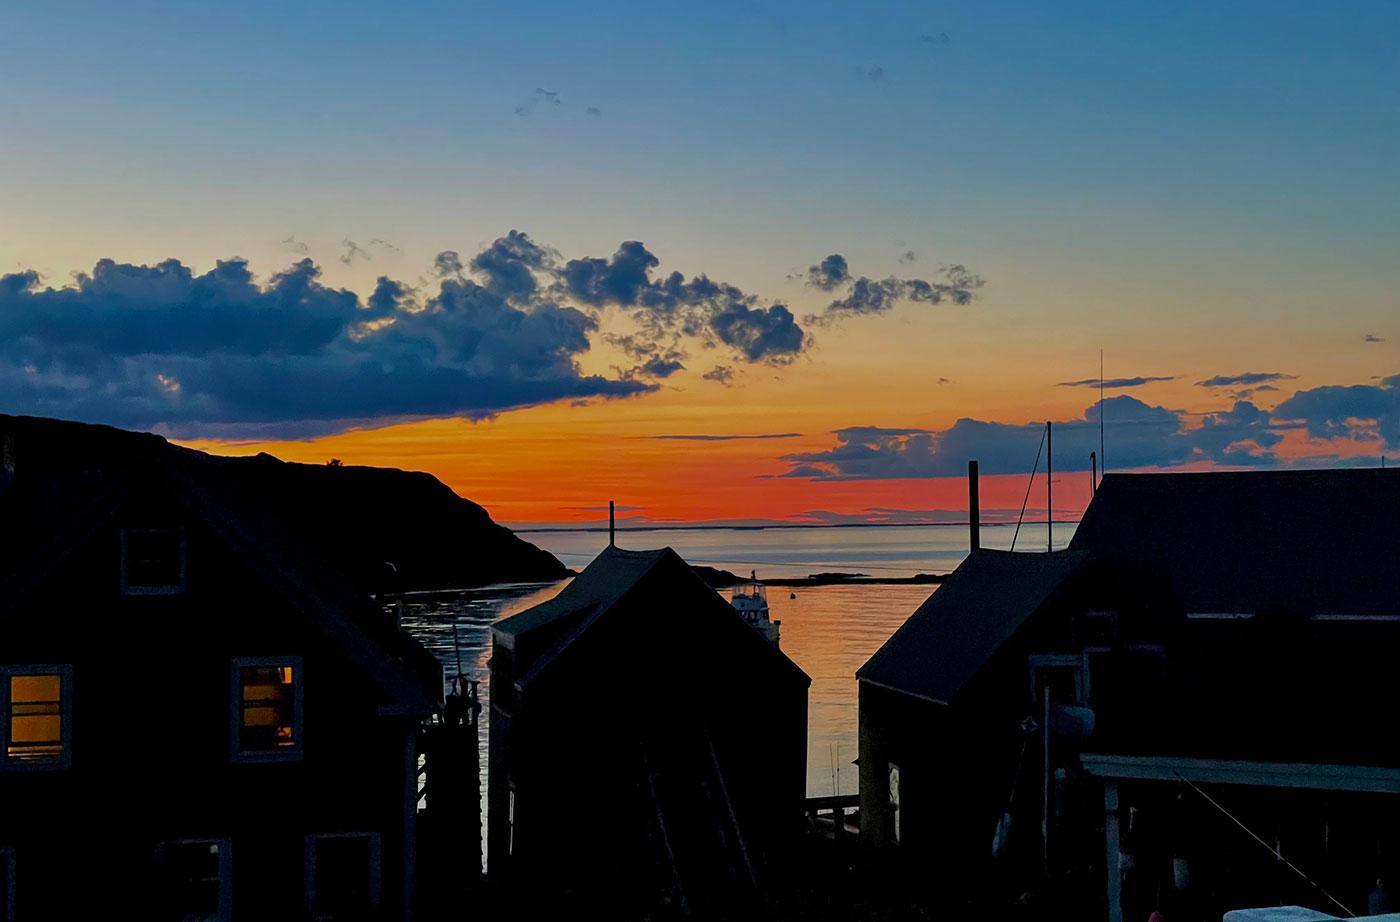 Sunrise over buildings at Maine coast